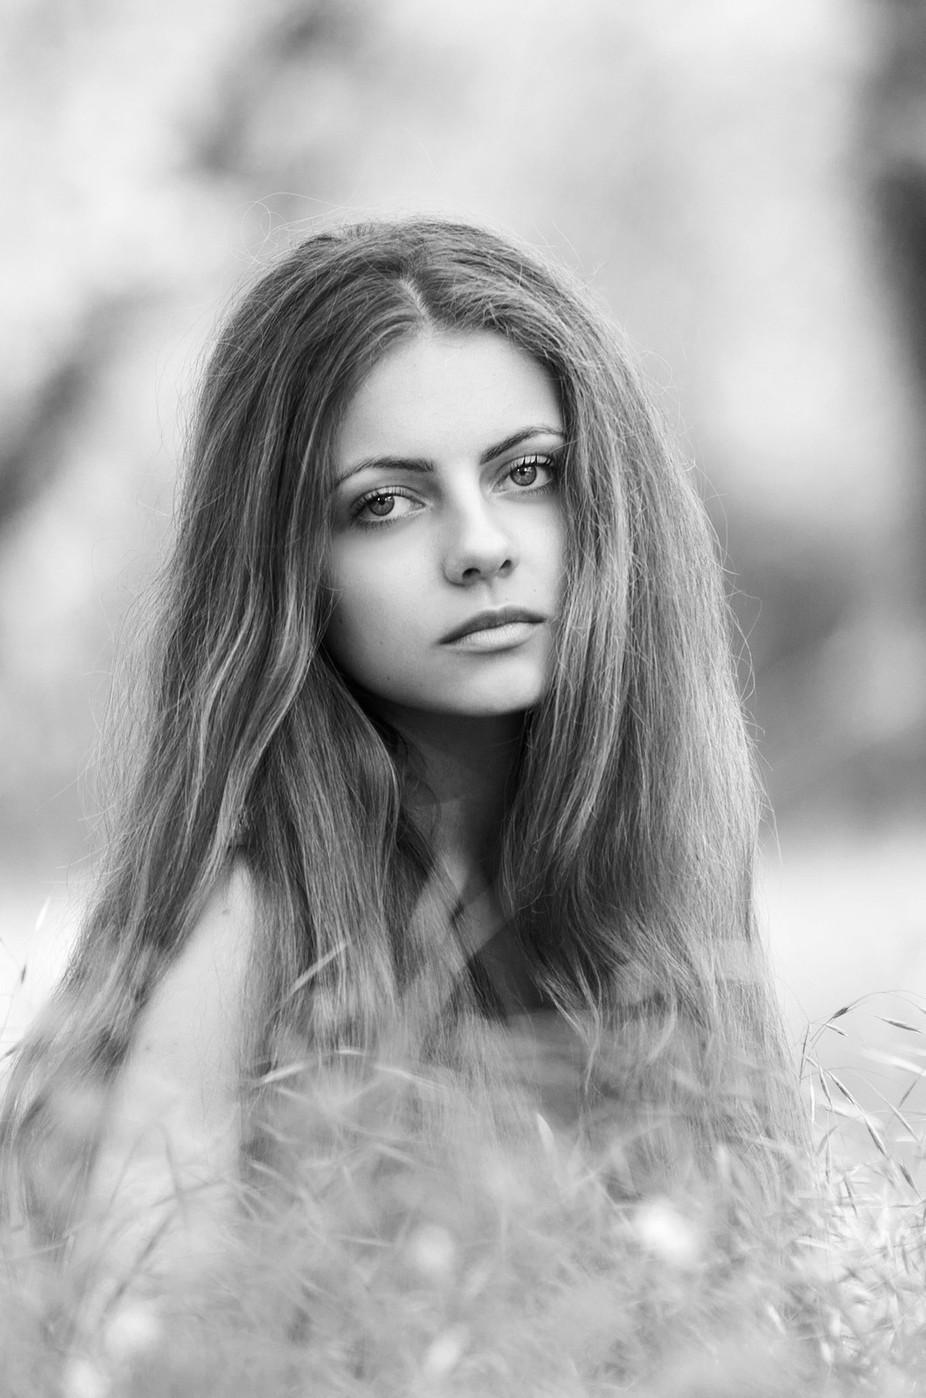 Arina  by usachevalexander - Monthly Pro Vol 21 Photo Contest